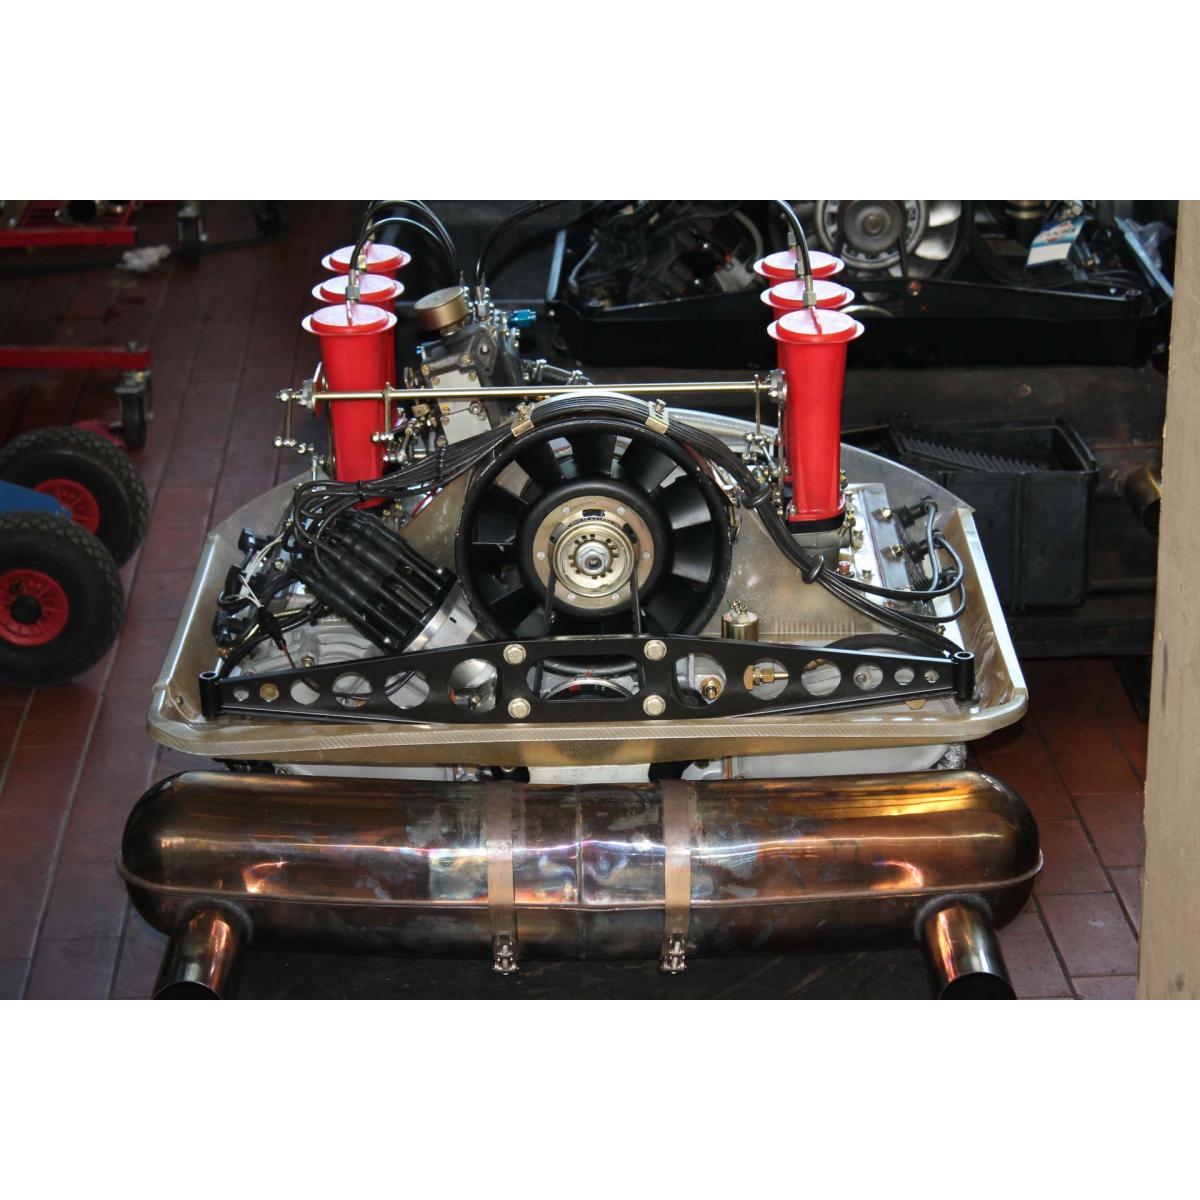 "Motor komplett, 3,0 RSR MFI ""Astronom"", 332 PS/ 323 Nm"